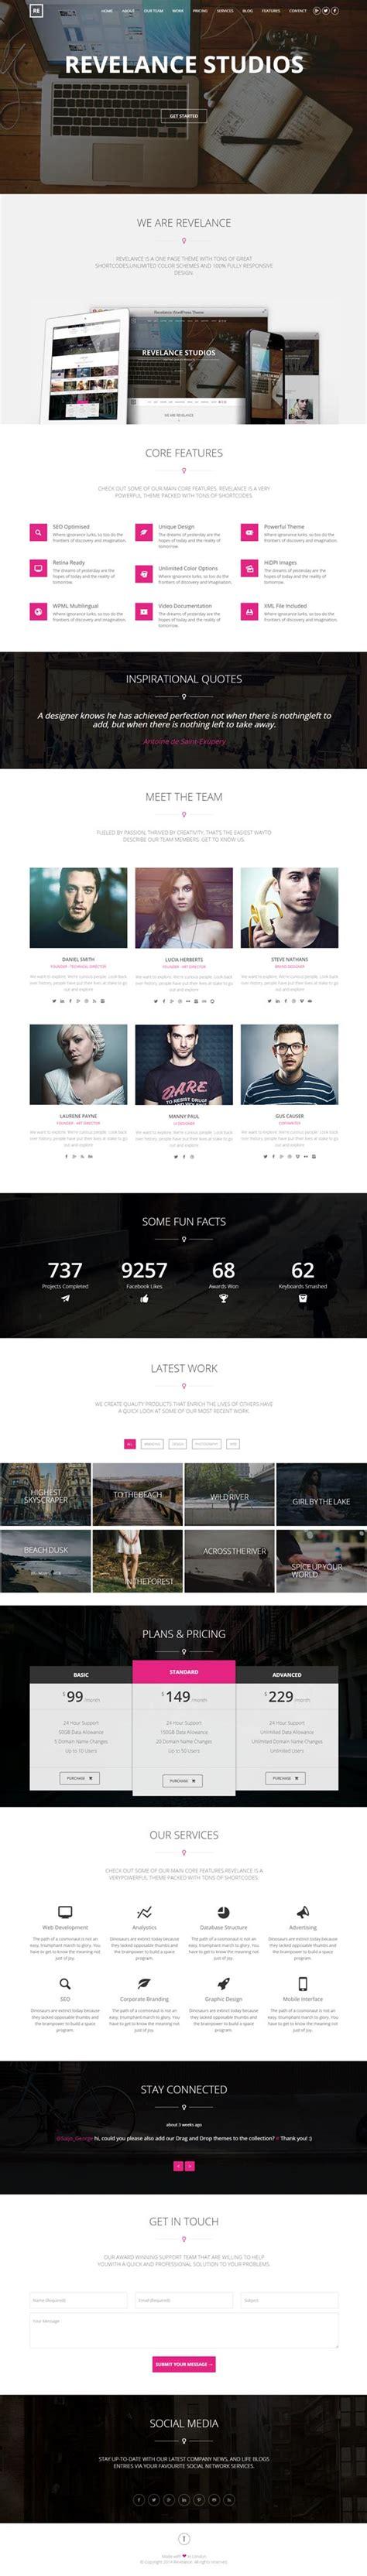 new responsive html5 website templates design graphic